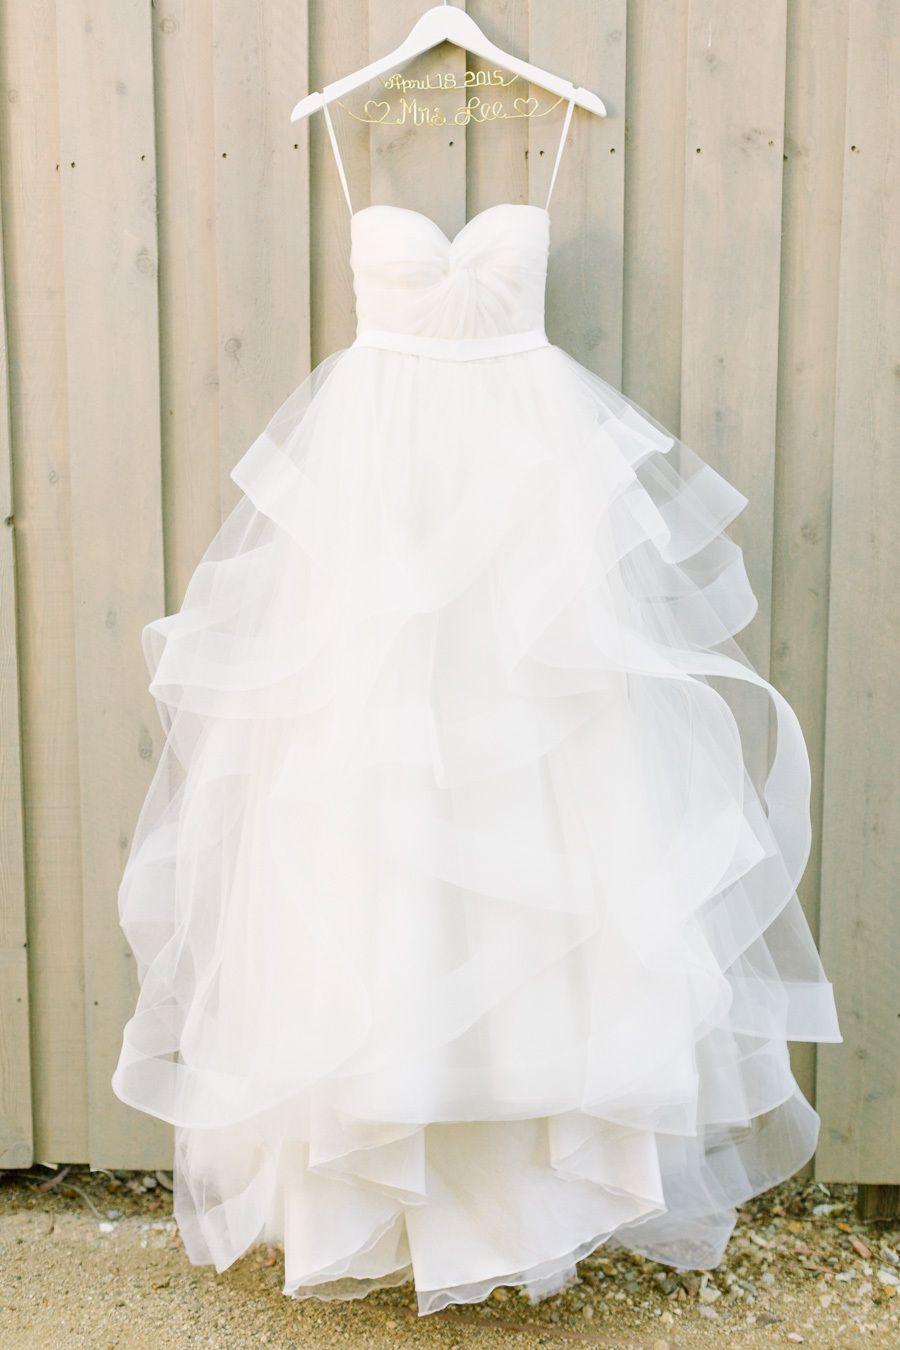 7b200db4d Photography  Koman Photography komanphotography.com Wedding Dress  Shin Bu  Bridal projectwedding.com View more   http   stylemepretty.com vault gallery 36147